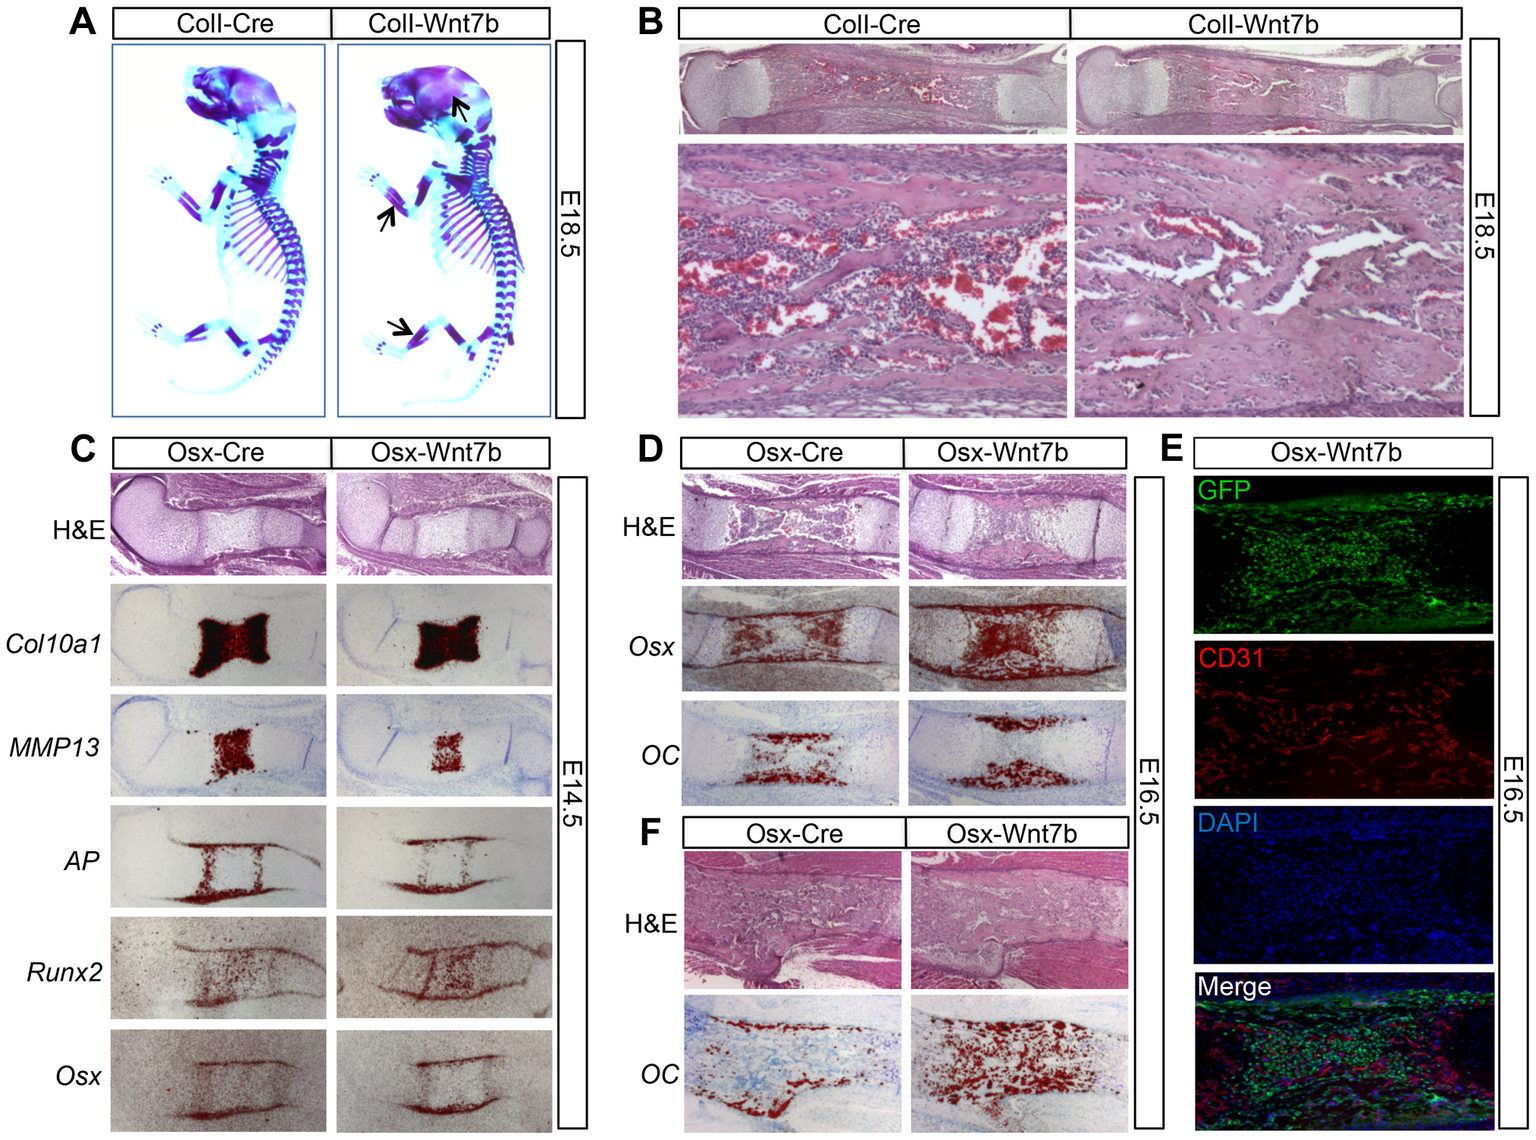 WNT7B stimulates bone acquisition in the embryo.